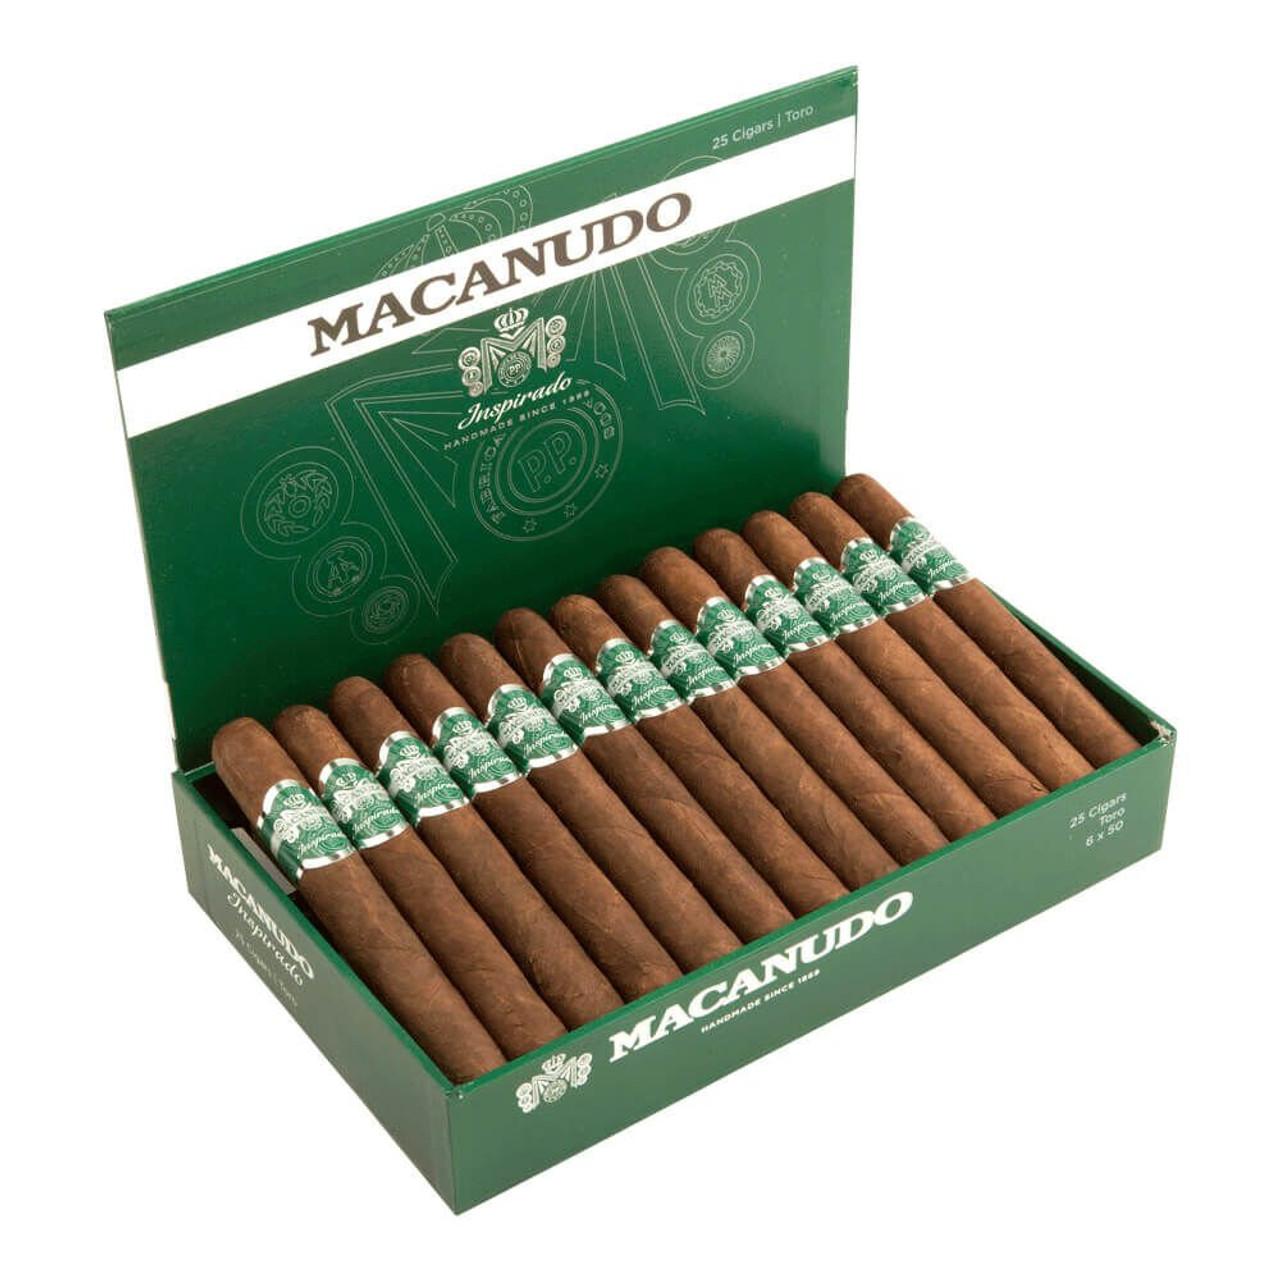 Macanudo Inspirado Green Toro Cigars - 6.0 x 50 (Box of 25)